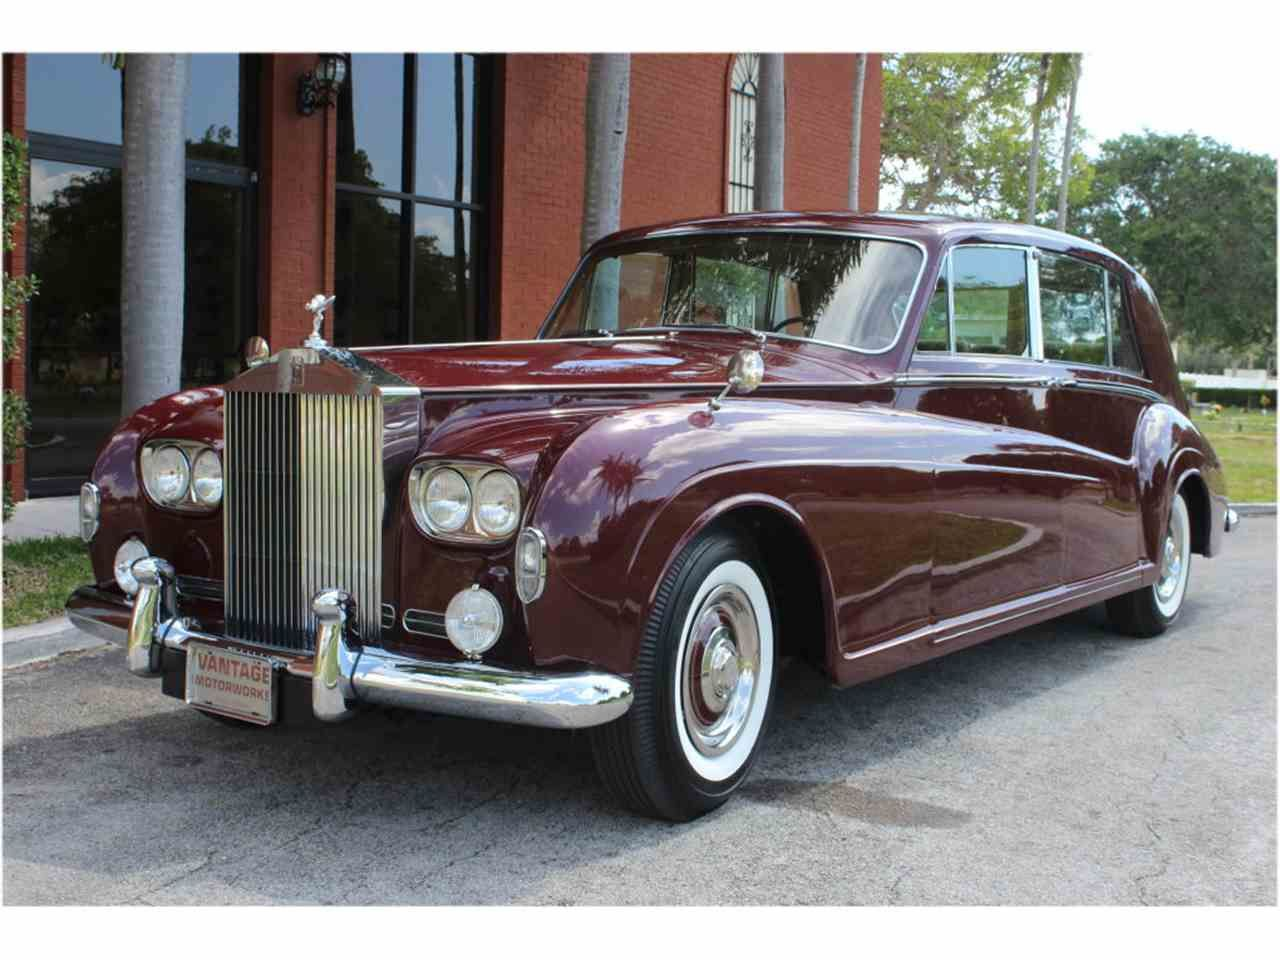 1966 Rolls Royce Phantom V in burgundy Rolls royce